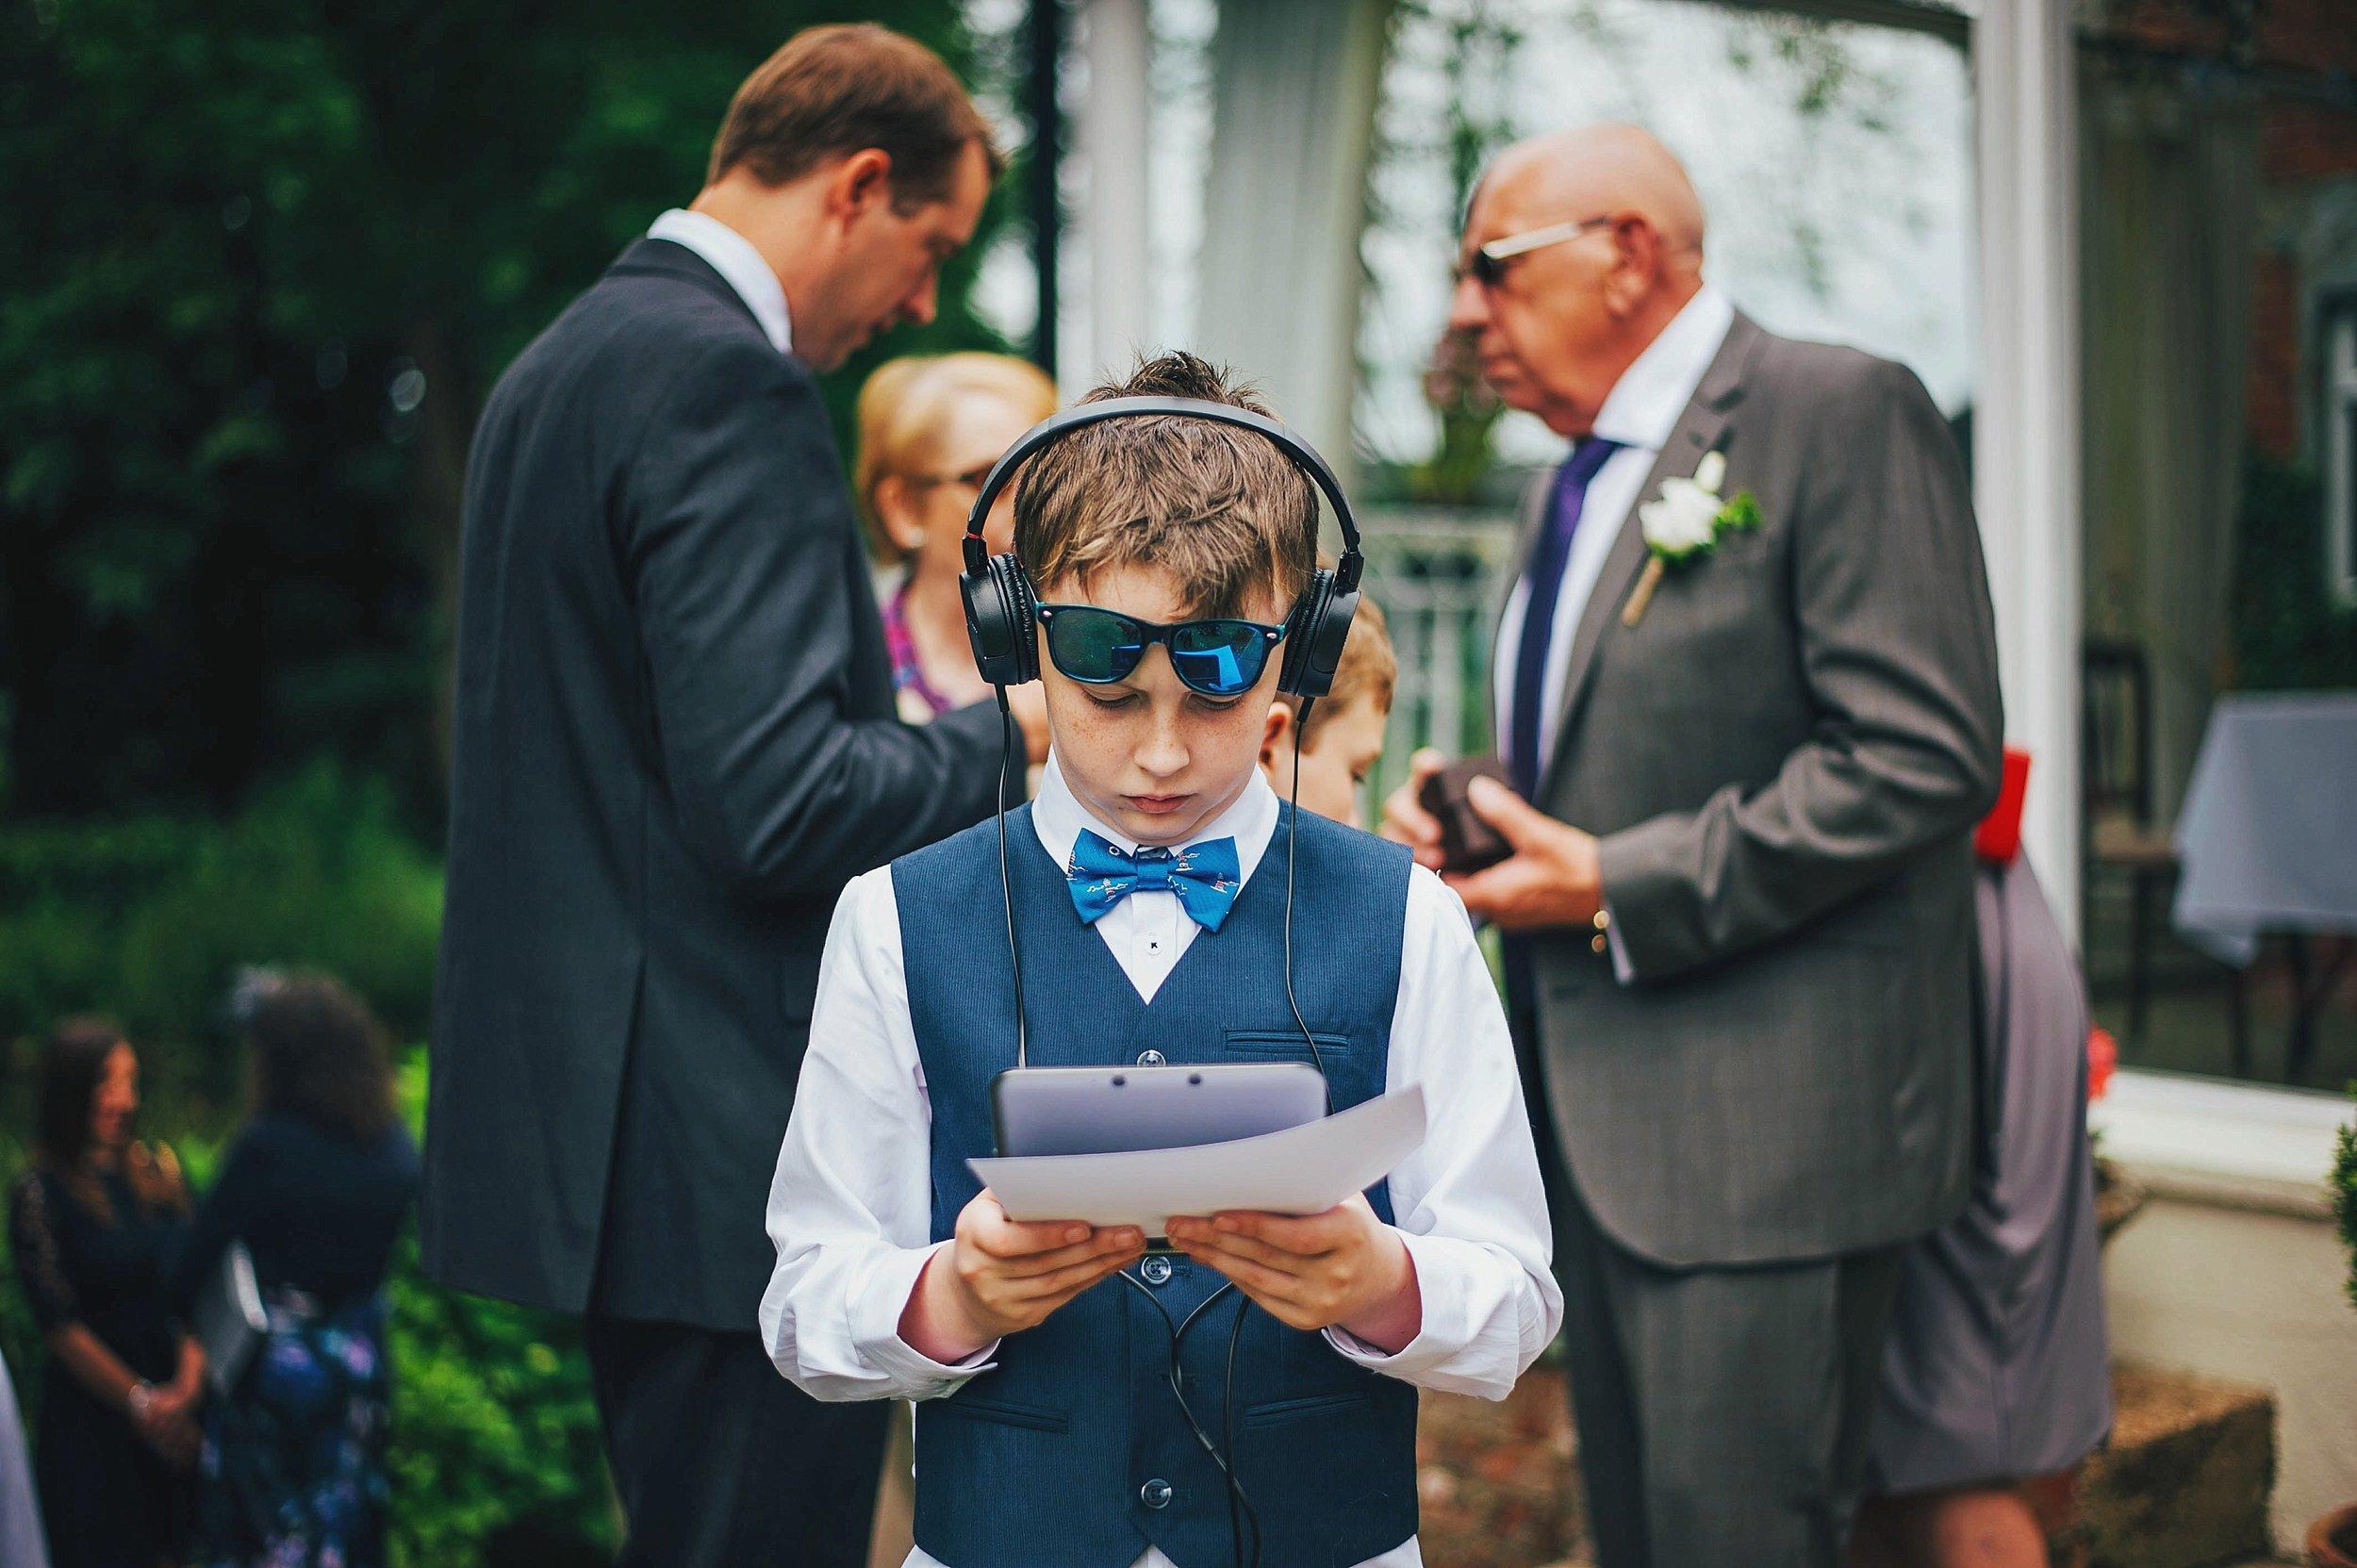 Rustic Secret Garden Inspired Baddow Park Wedding Essex UK Documentary Wedding Photographer